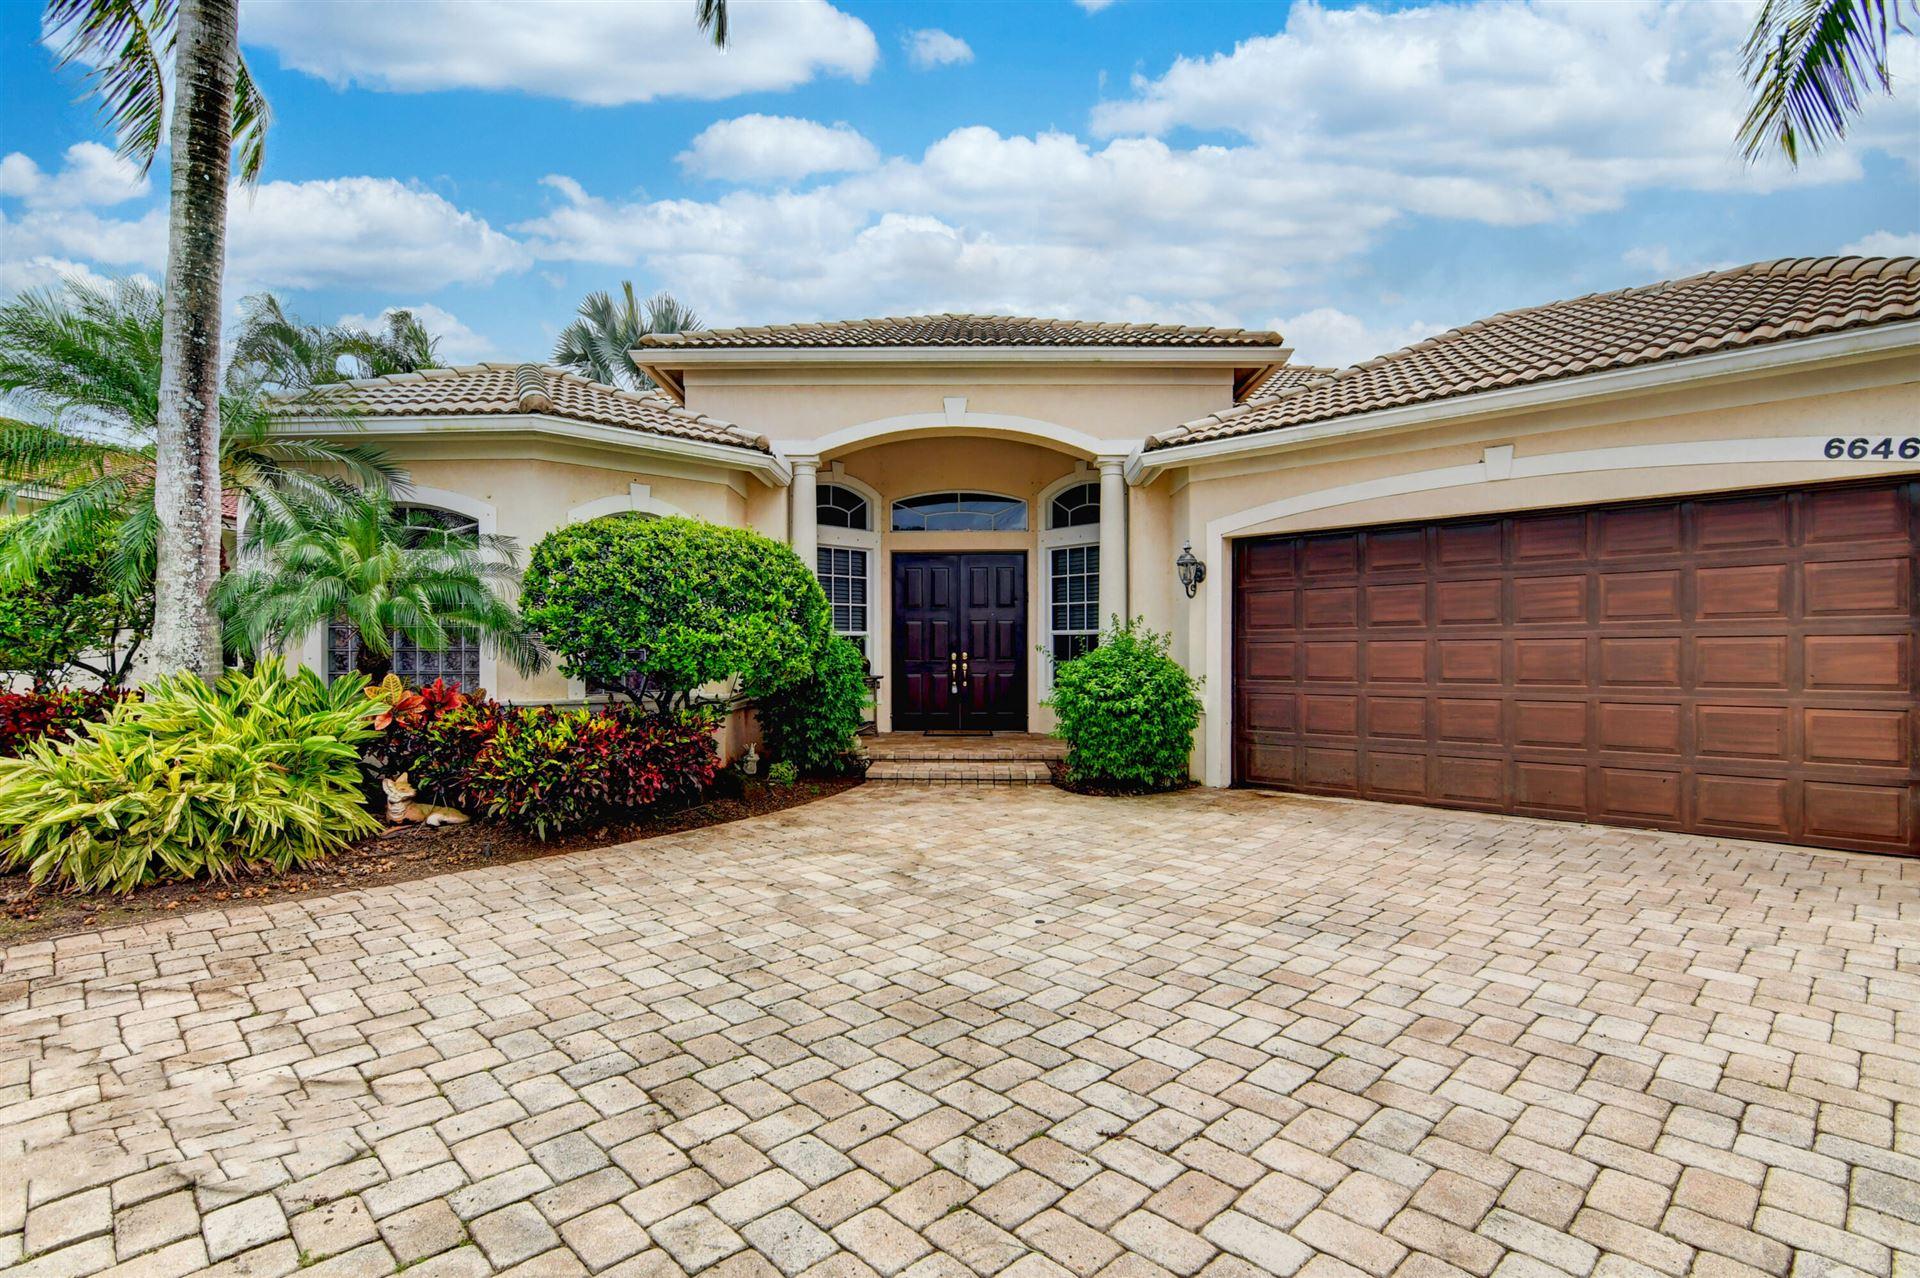 6646 Cobia Circle, Boynton Beach, FL 33437 - MLS#: RX-10743292